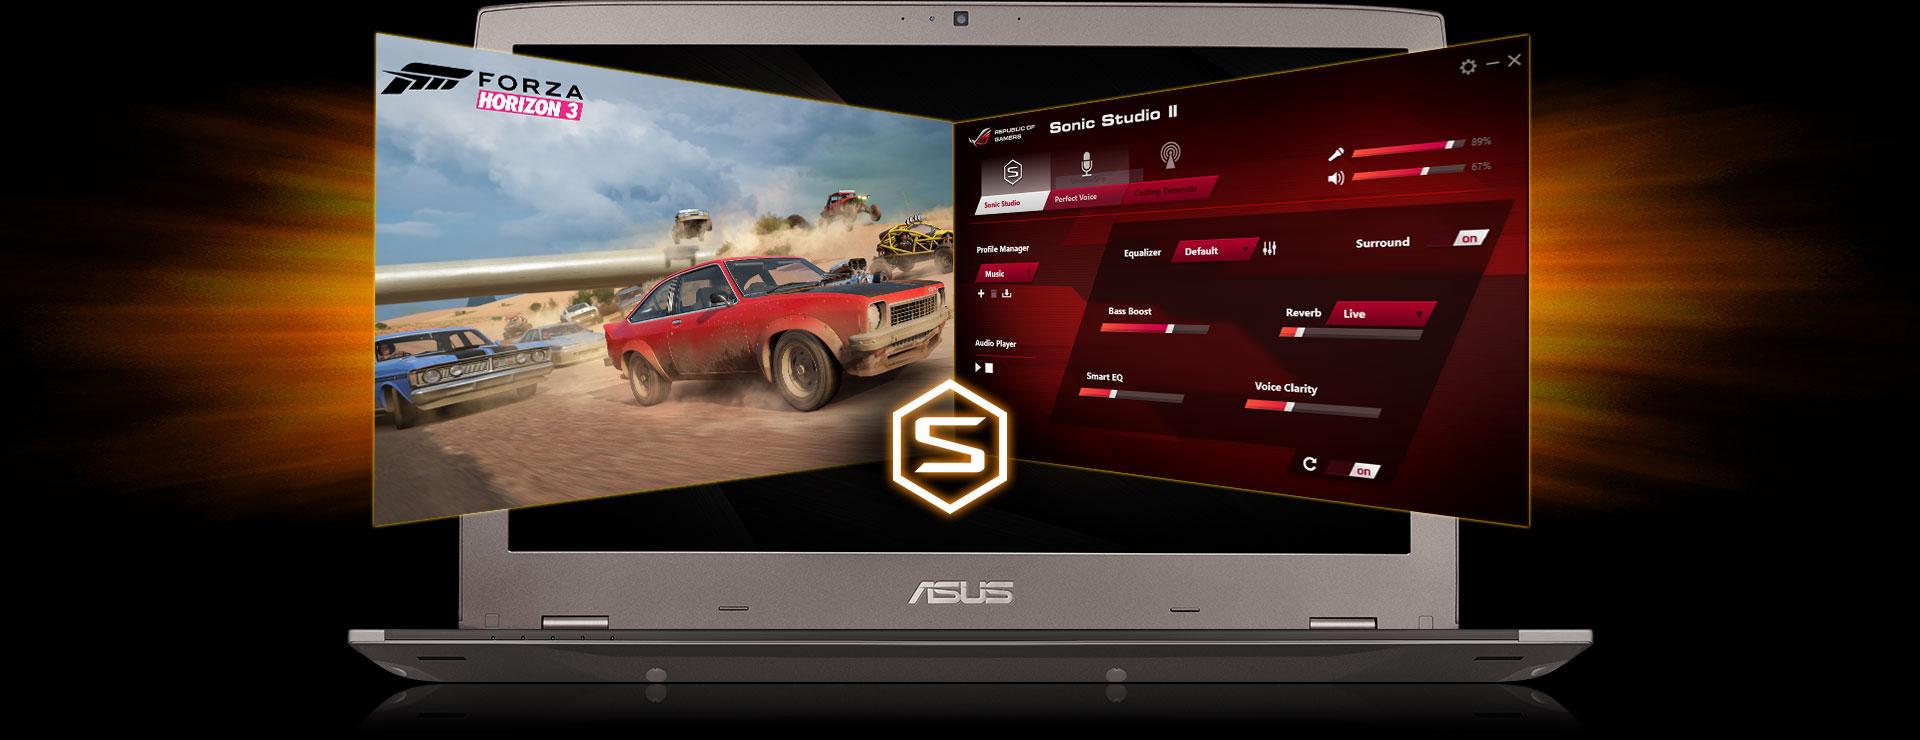 Asus ROG G701VIK-BA047T 17 3-in FHD Intel Core i7-7820HK GeForce GTX 1080